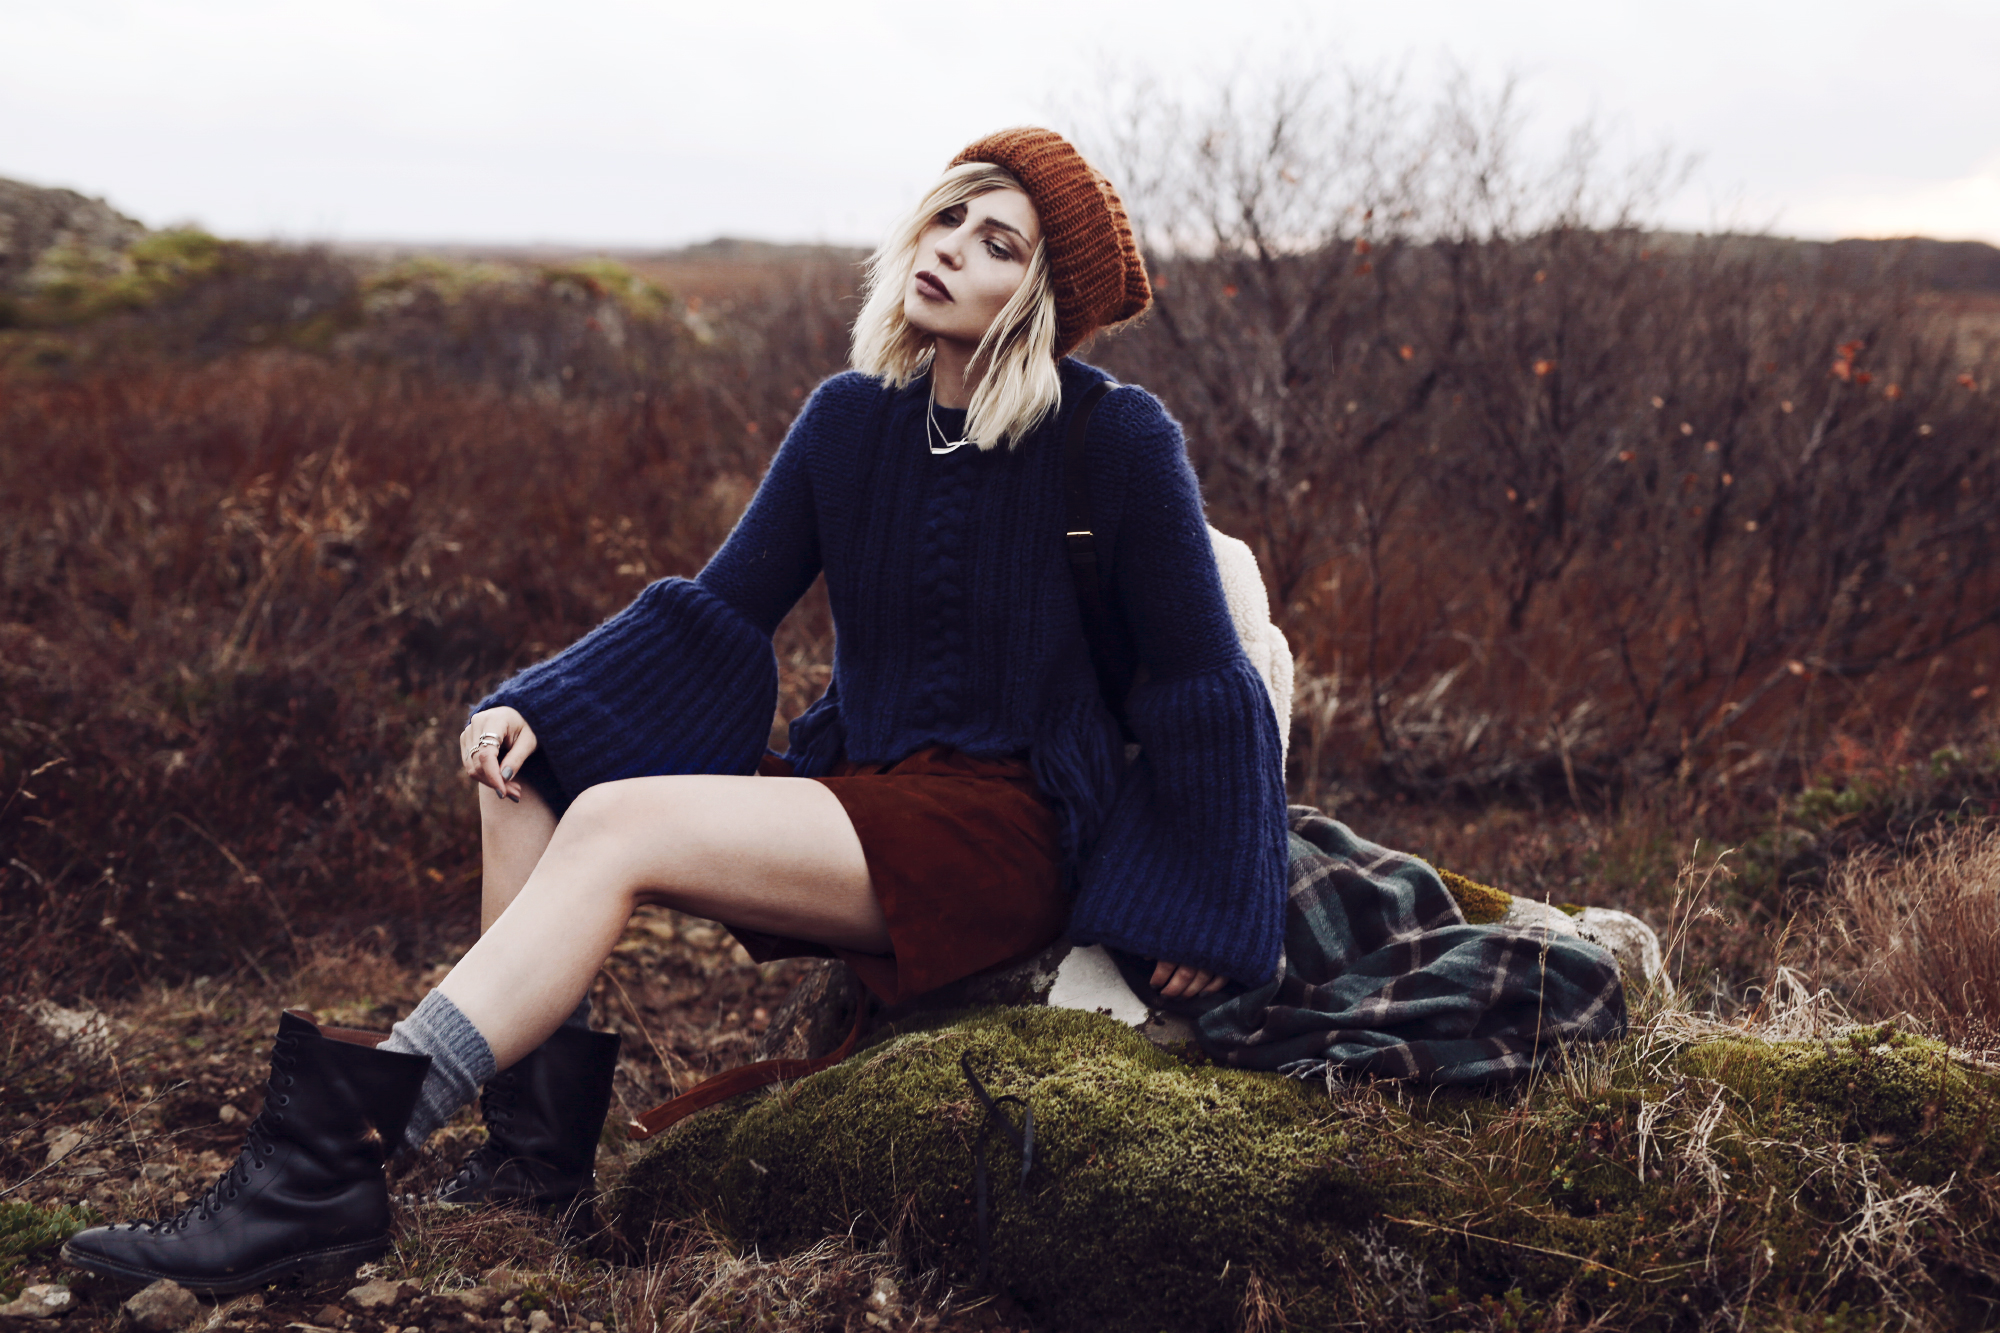 Trachtenmode modern interpretiert | Bergsteiger | style: german, folkloric, modern, stylish, traditional, nature, autumn